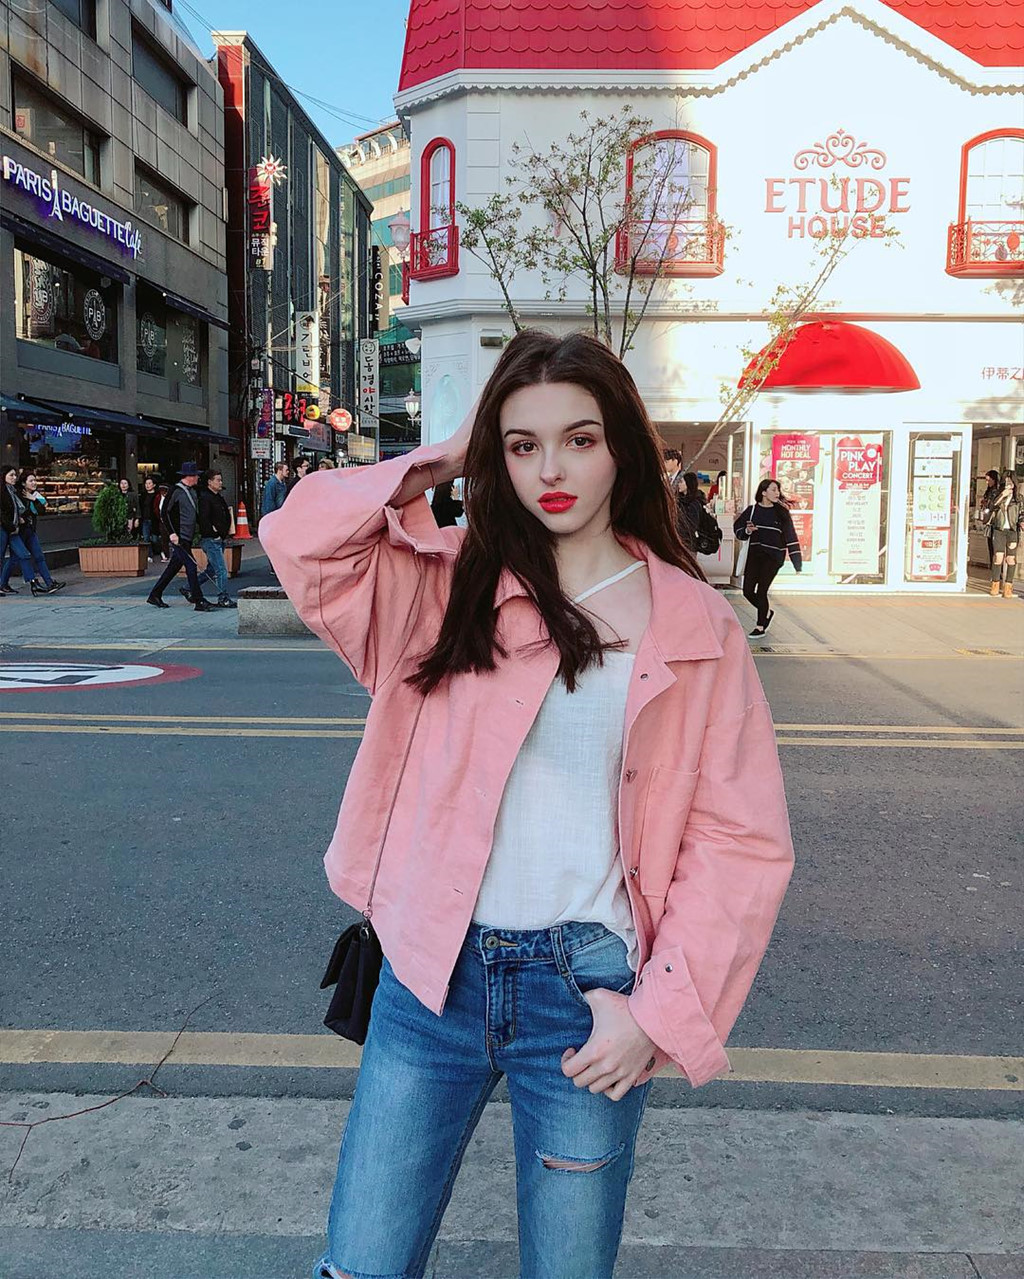 hot-girl-Karimova-Elina-dao-tung-chao-gioi-tre-vi-qua-xinh-dep (10)